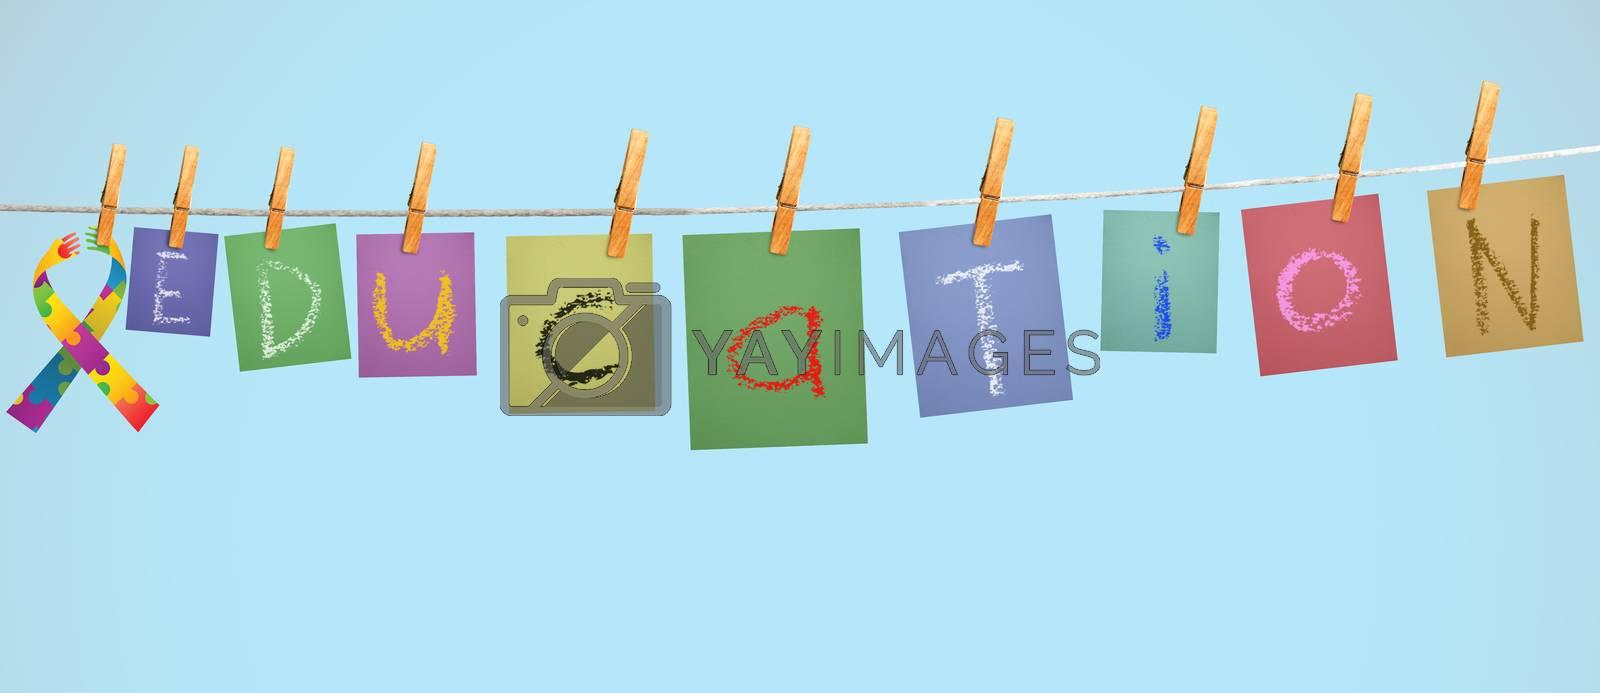 education against digitally generated grey background